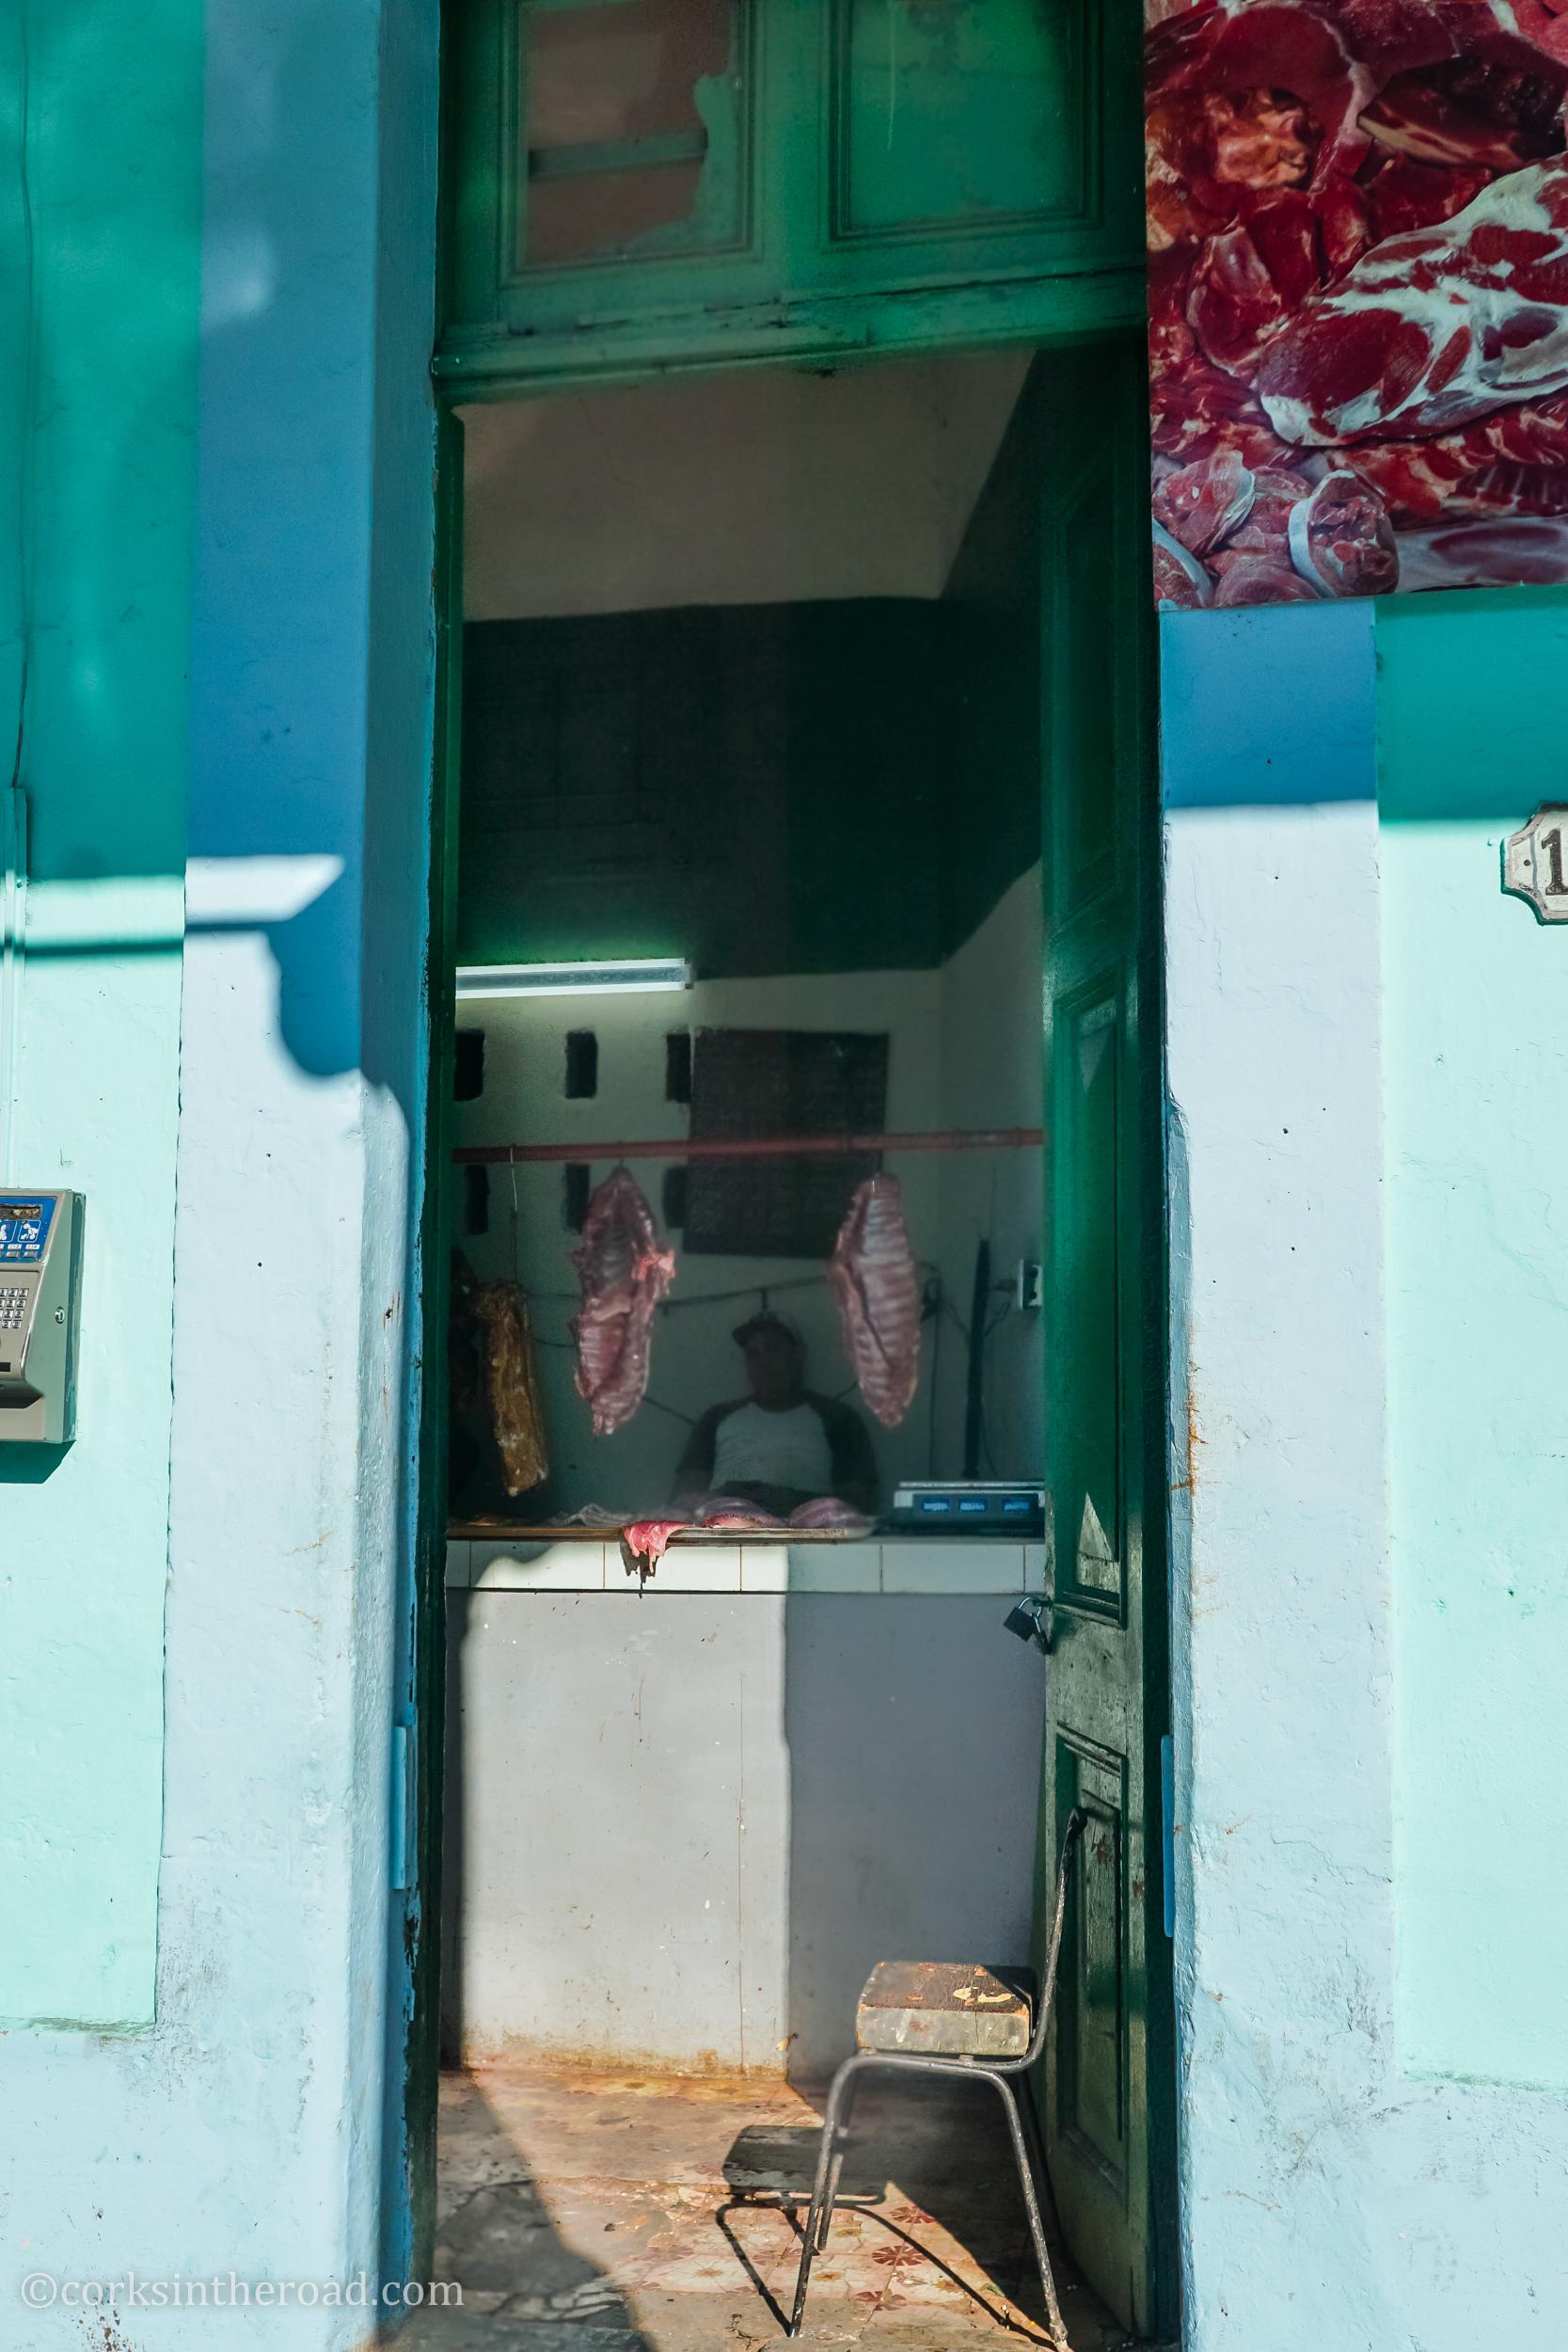 Architecture, Corksintheroad, Cuba, Doorways, Havana, People.jpg